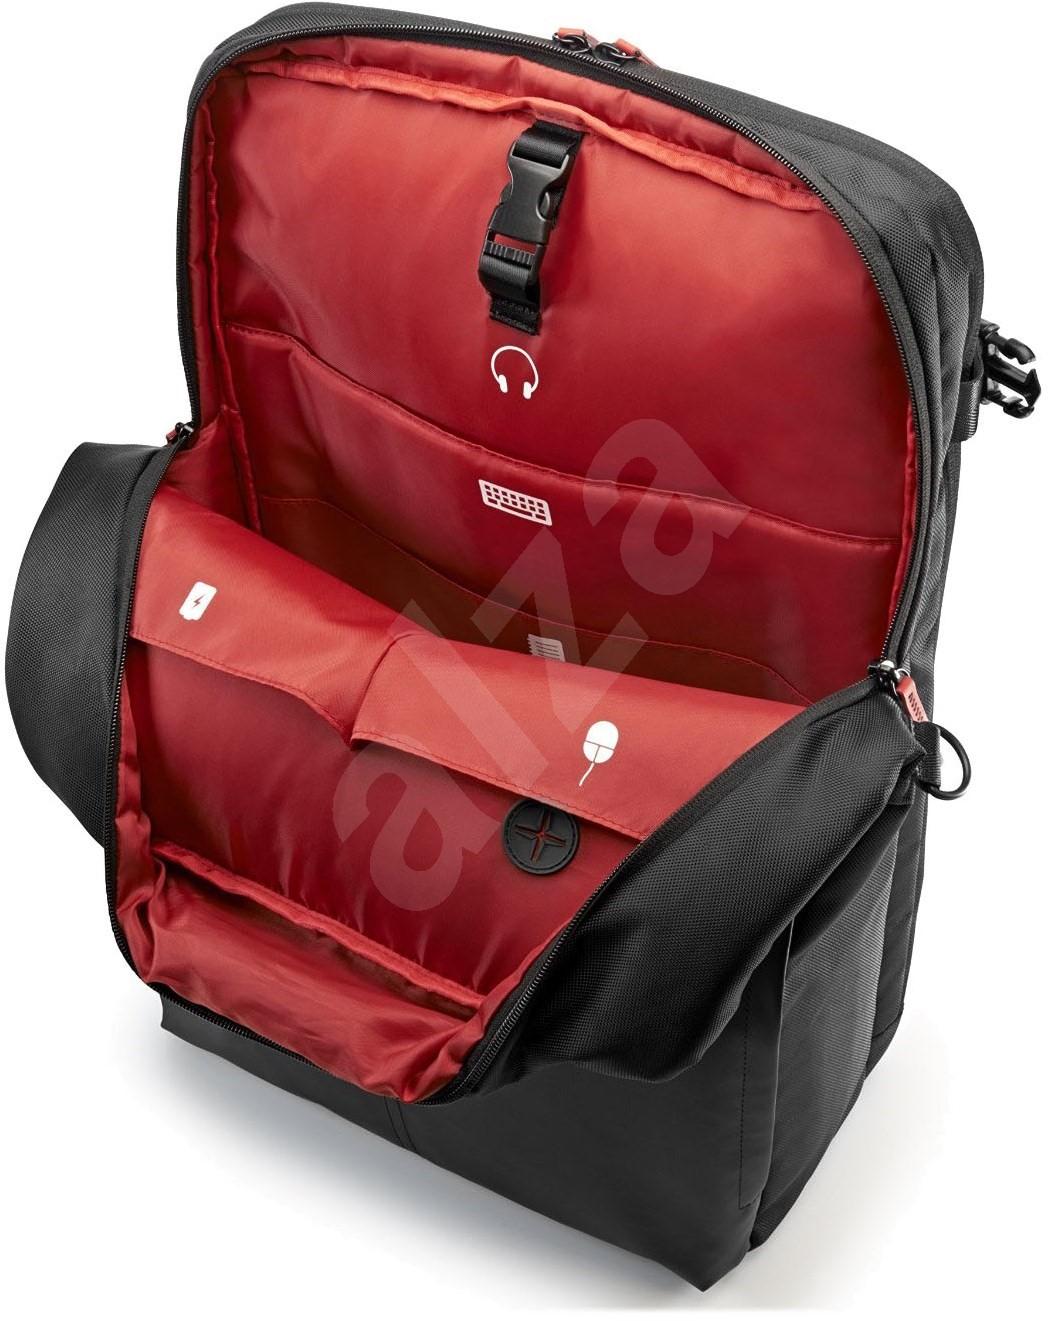 Hp Omen Gaming Backpack 17 3 Quot Laptop Backpack Alzashop Com